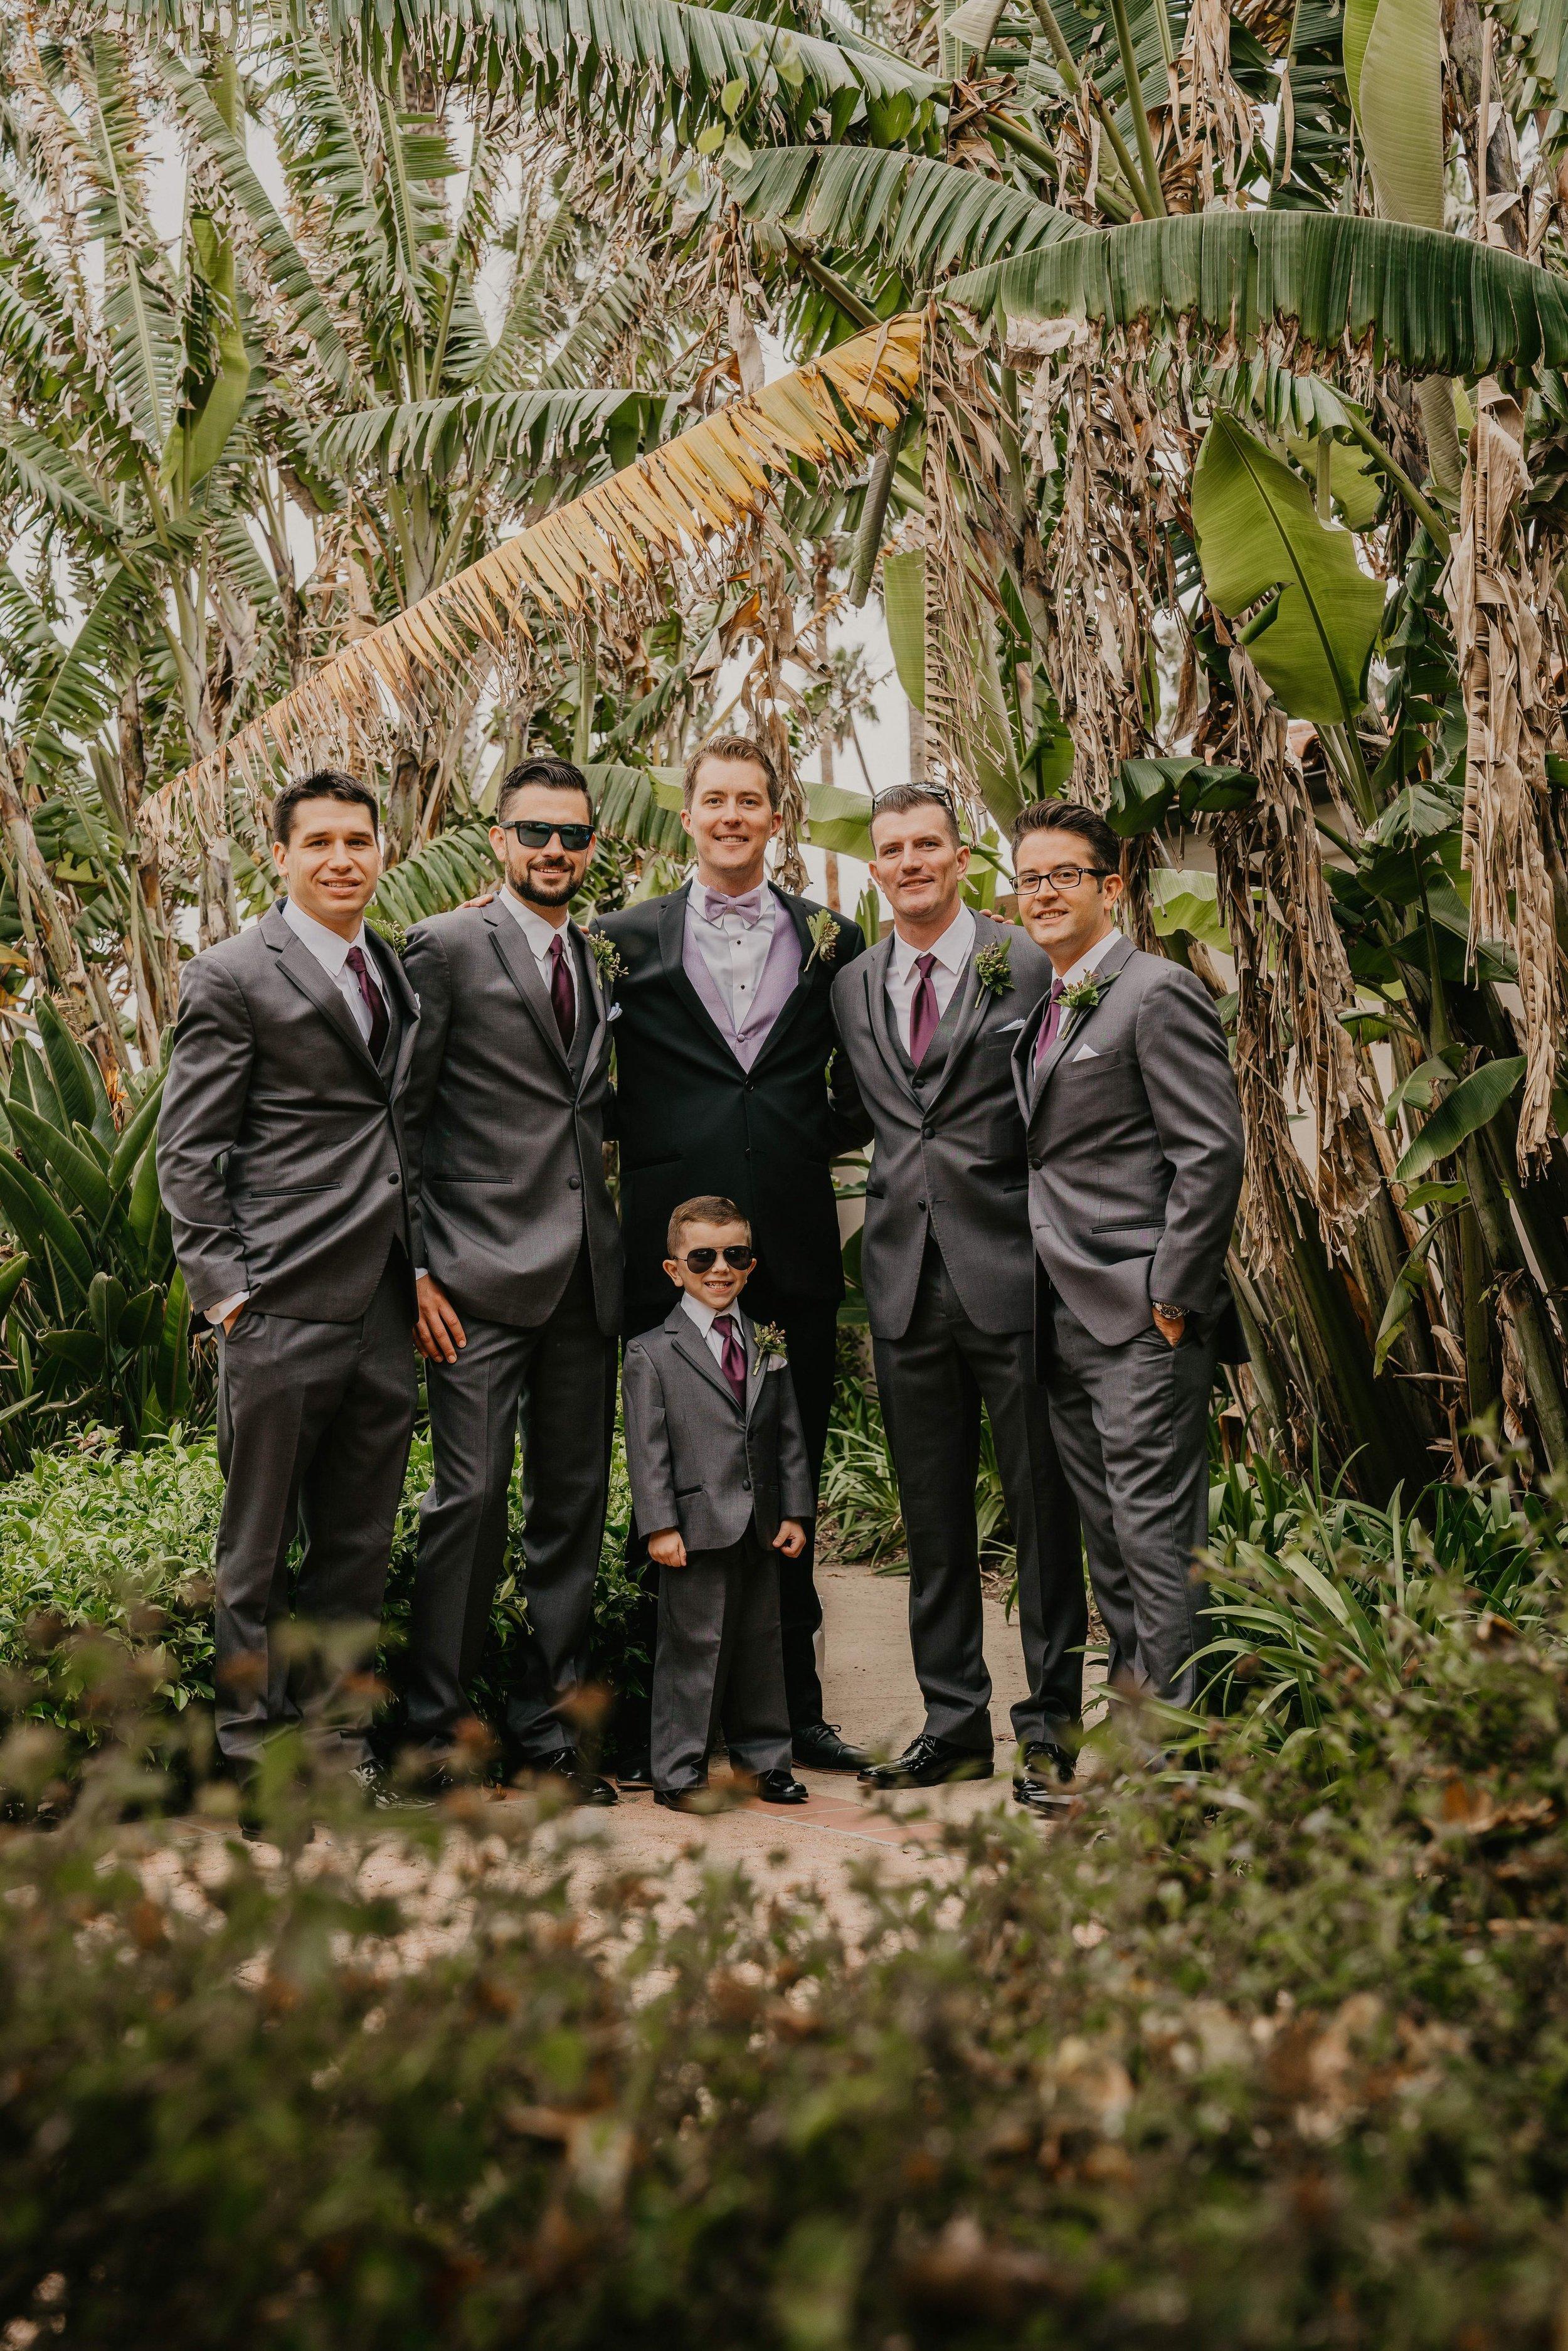 www.santabarbarawedding.com | Candice Marie Photography | Hilton Santa Barbara Beachfront Resort | Dalina Klan | Once in a Lifetime Weddings | Alpha Floral | Groom and Groomsmen